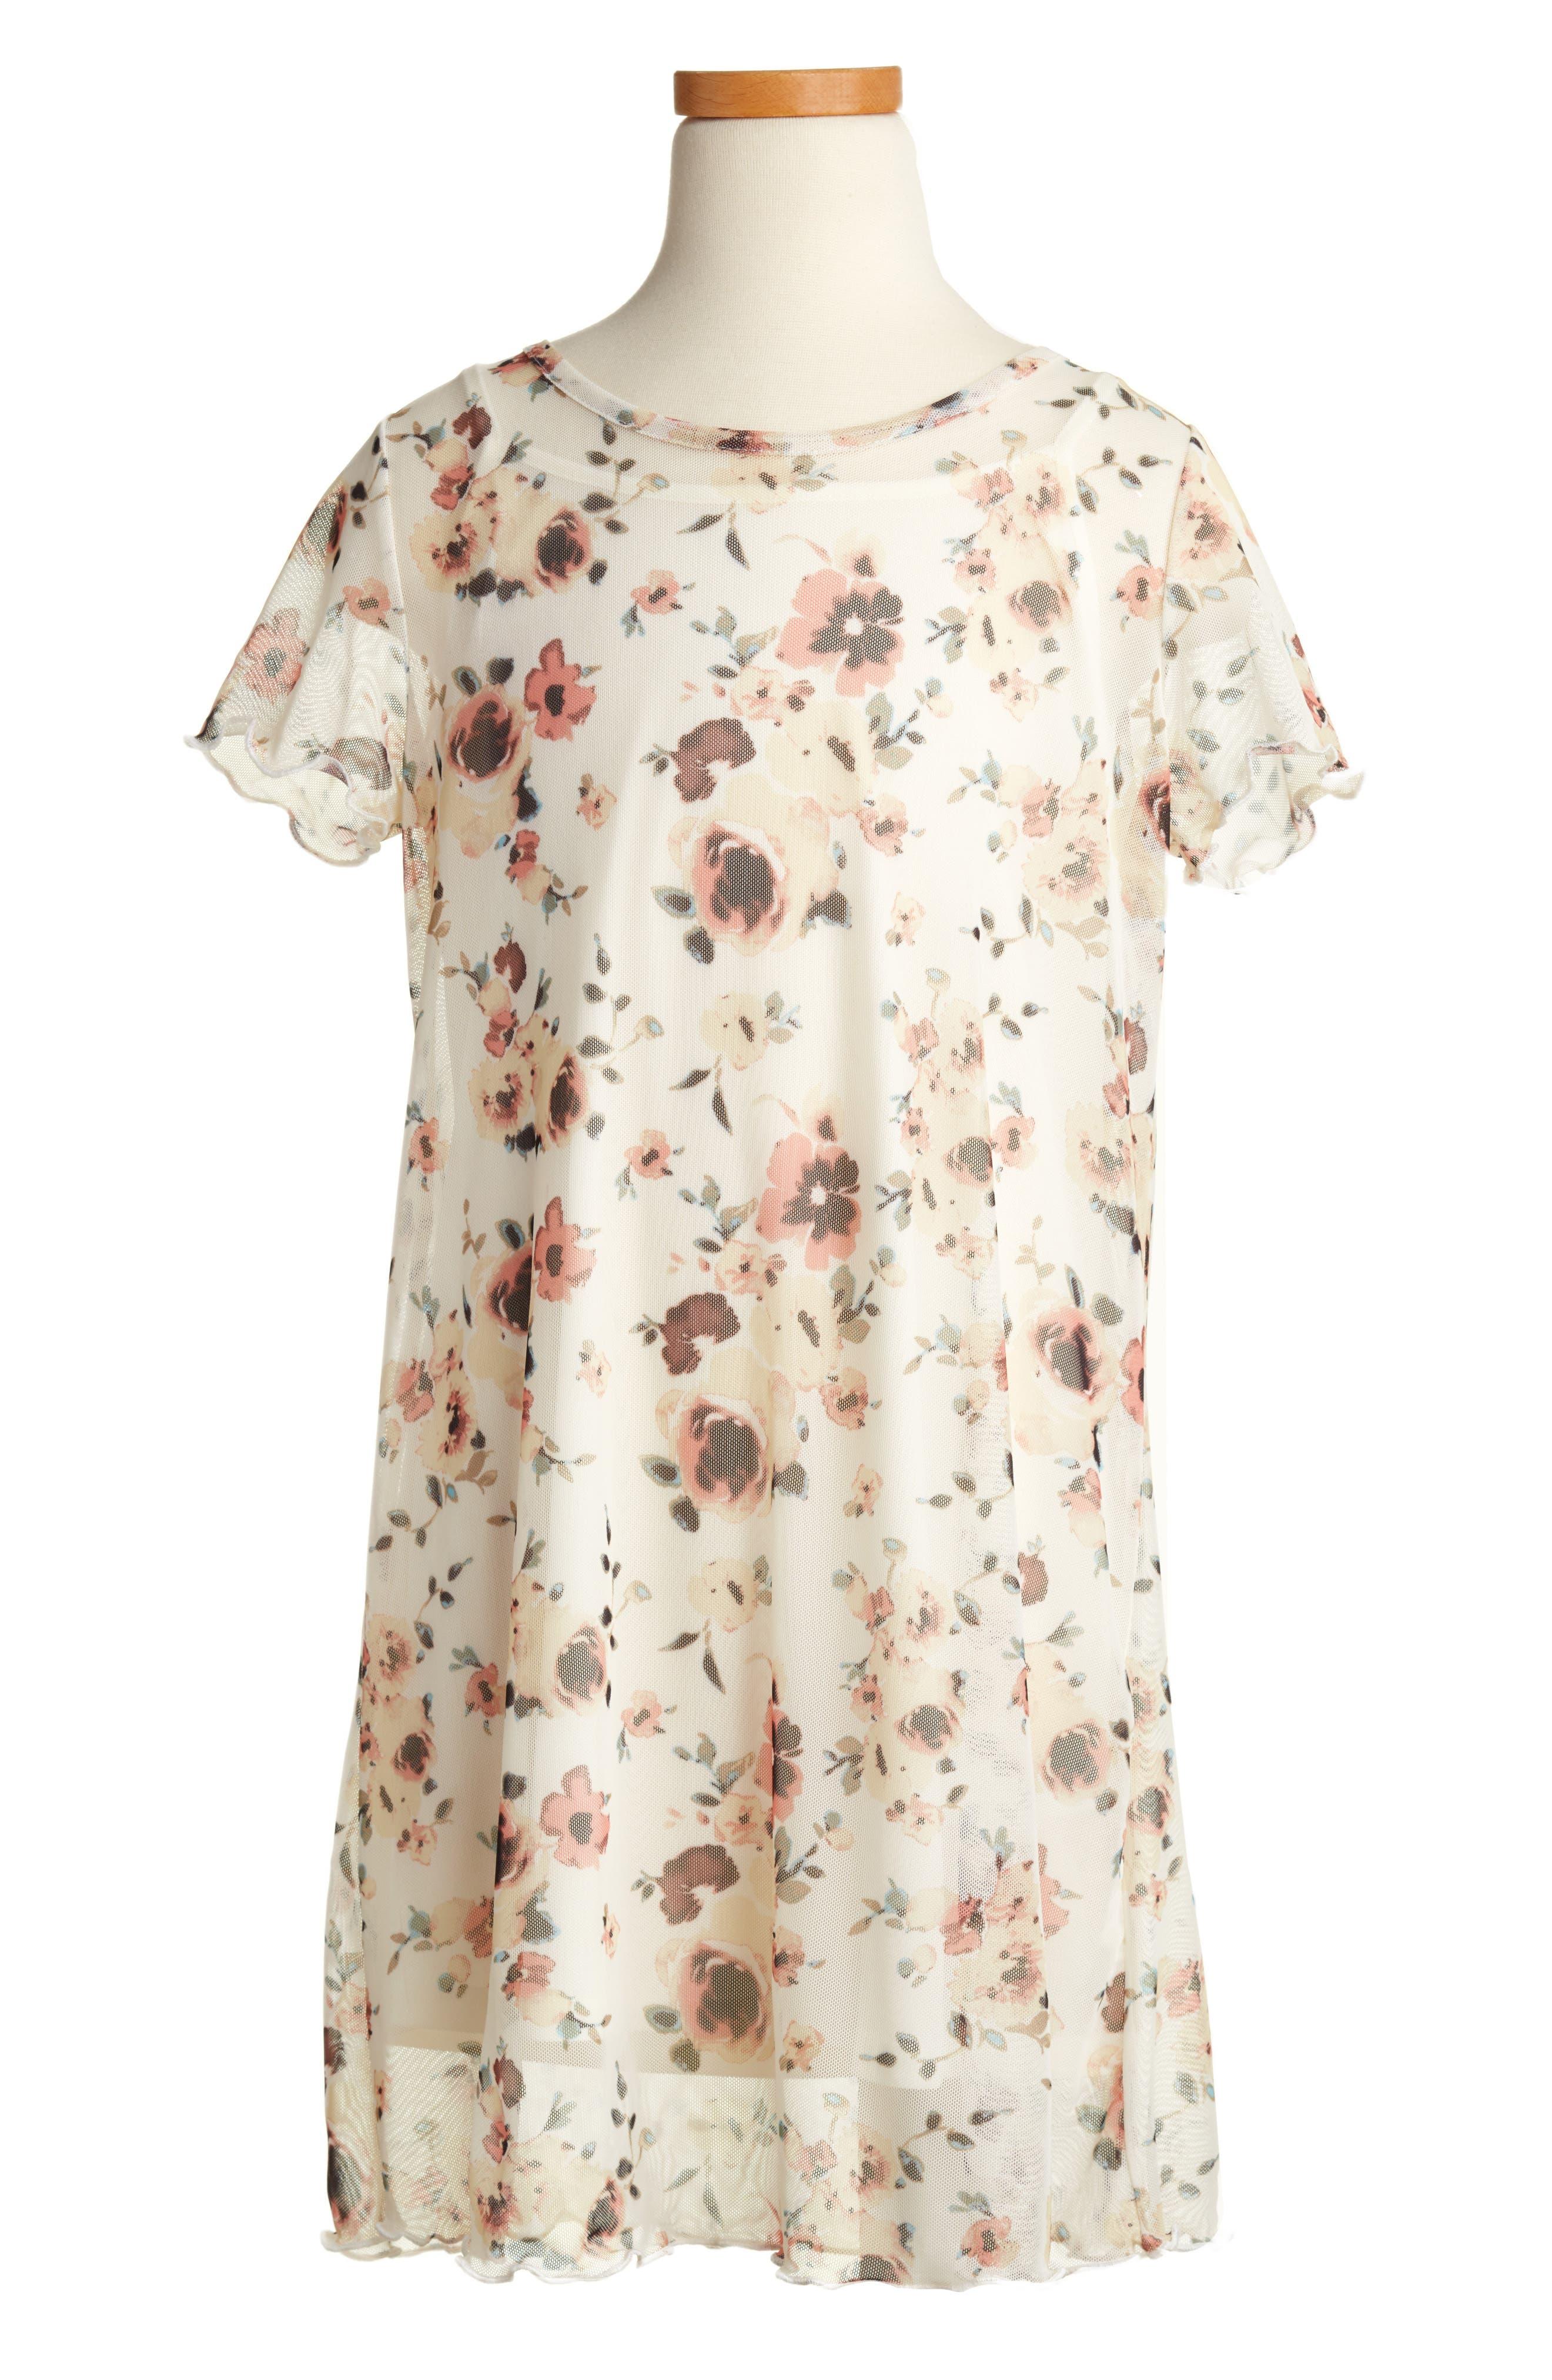 Alternate Image 1 Selected - Love, Fire Floral Mesh T-Shirt Dress (Big Girls)